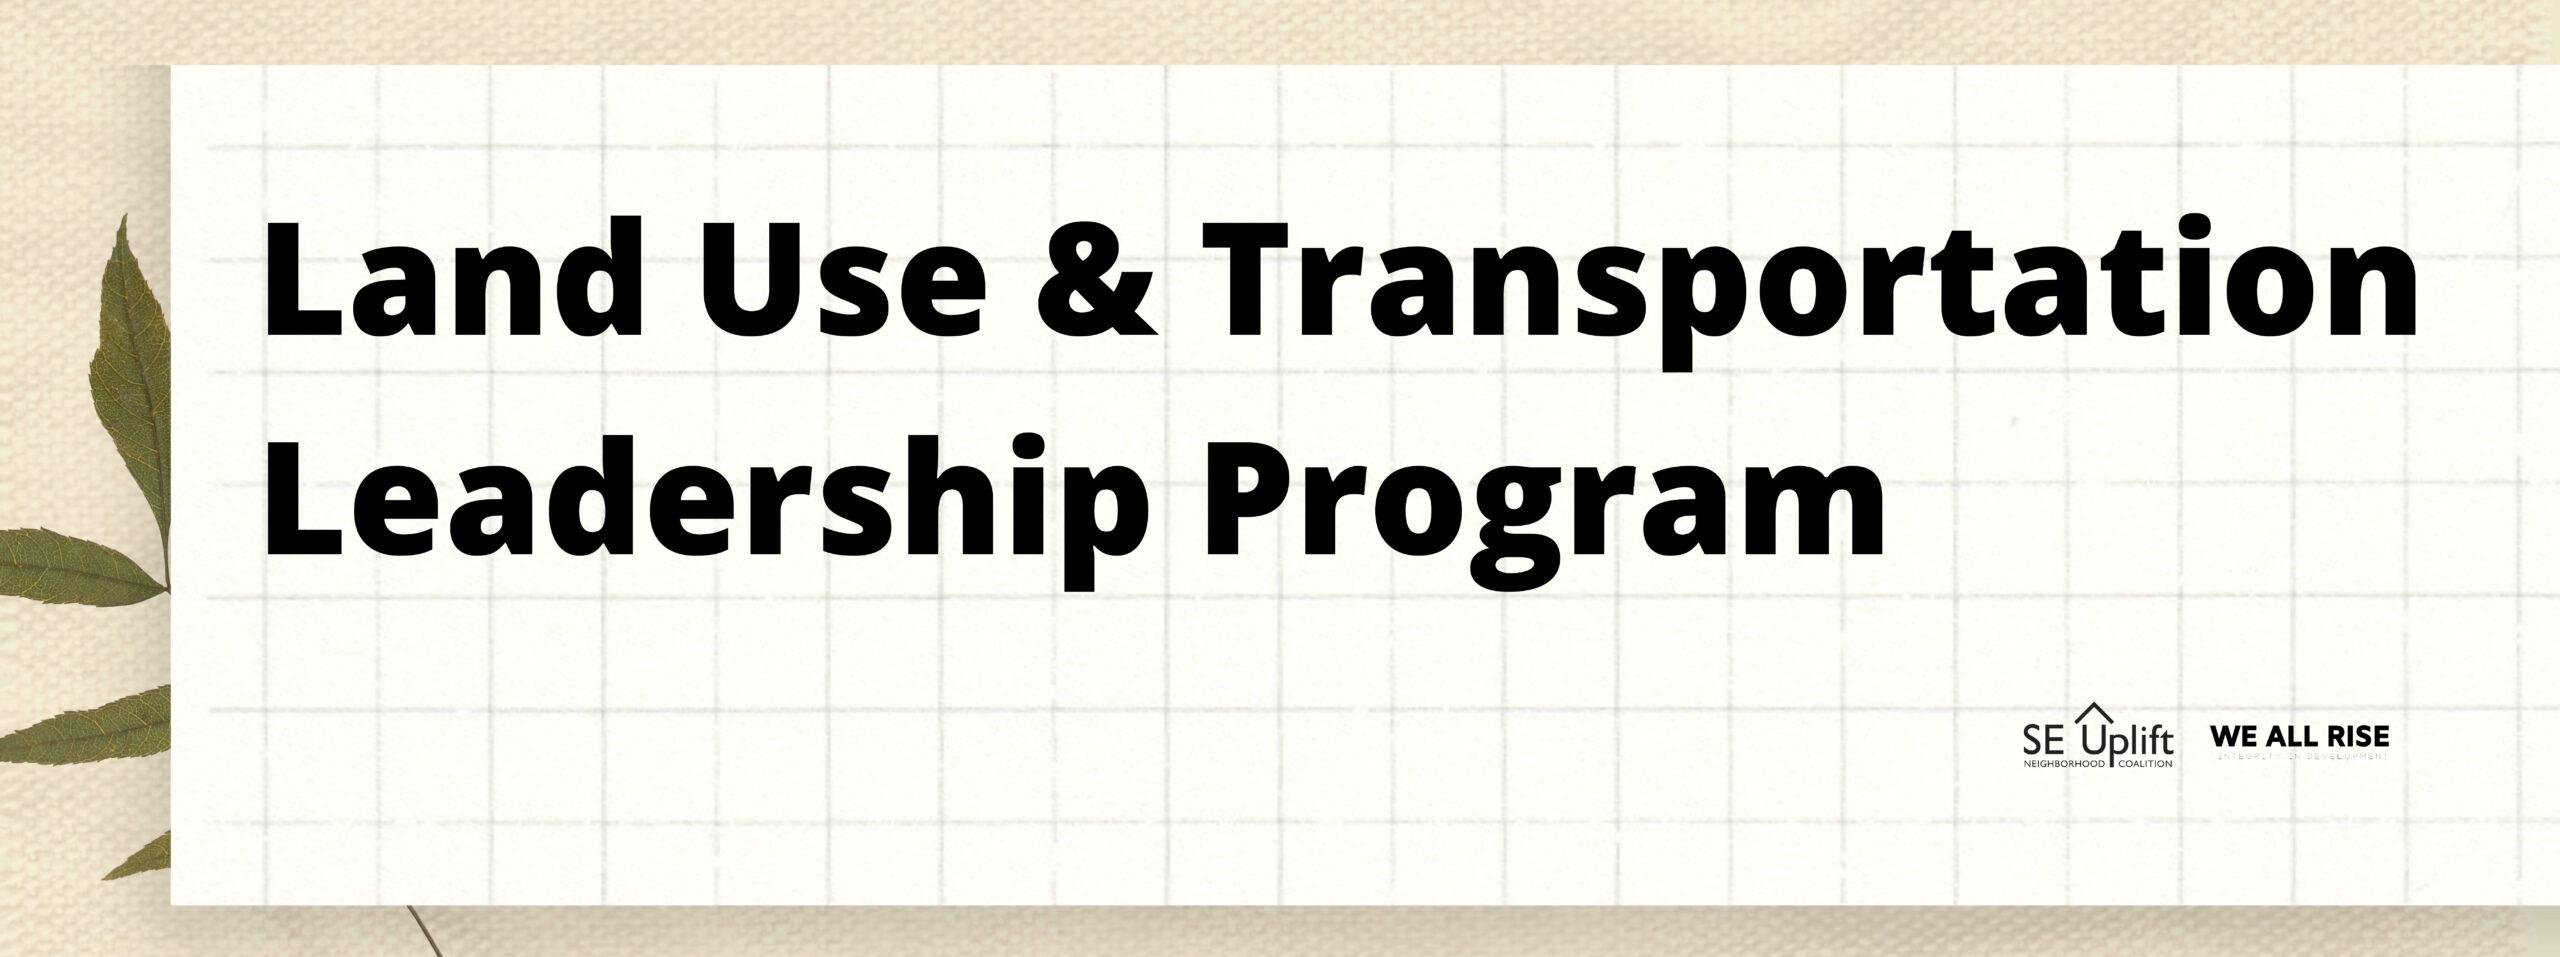 Land Use & Transportation Leadership Program